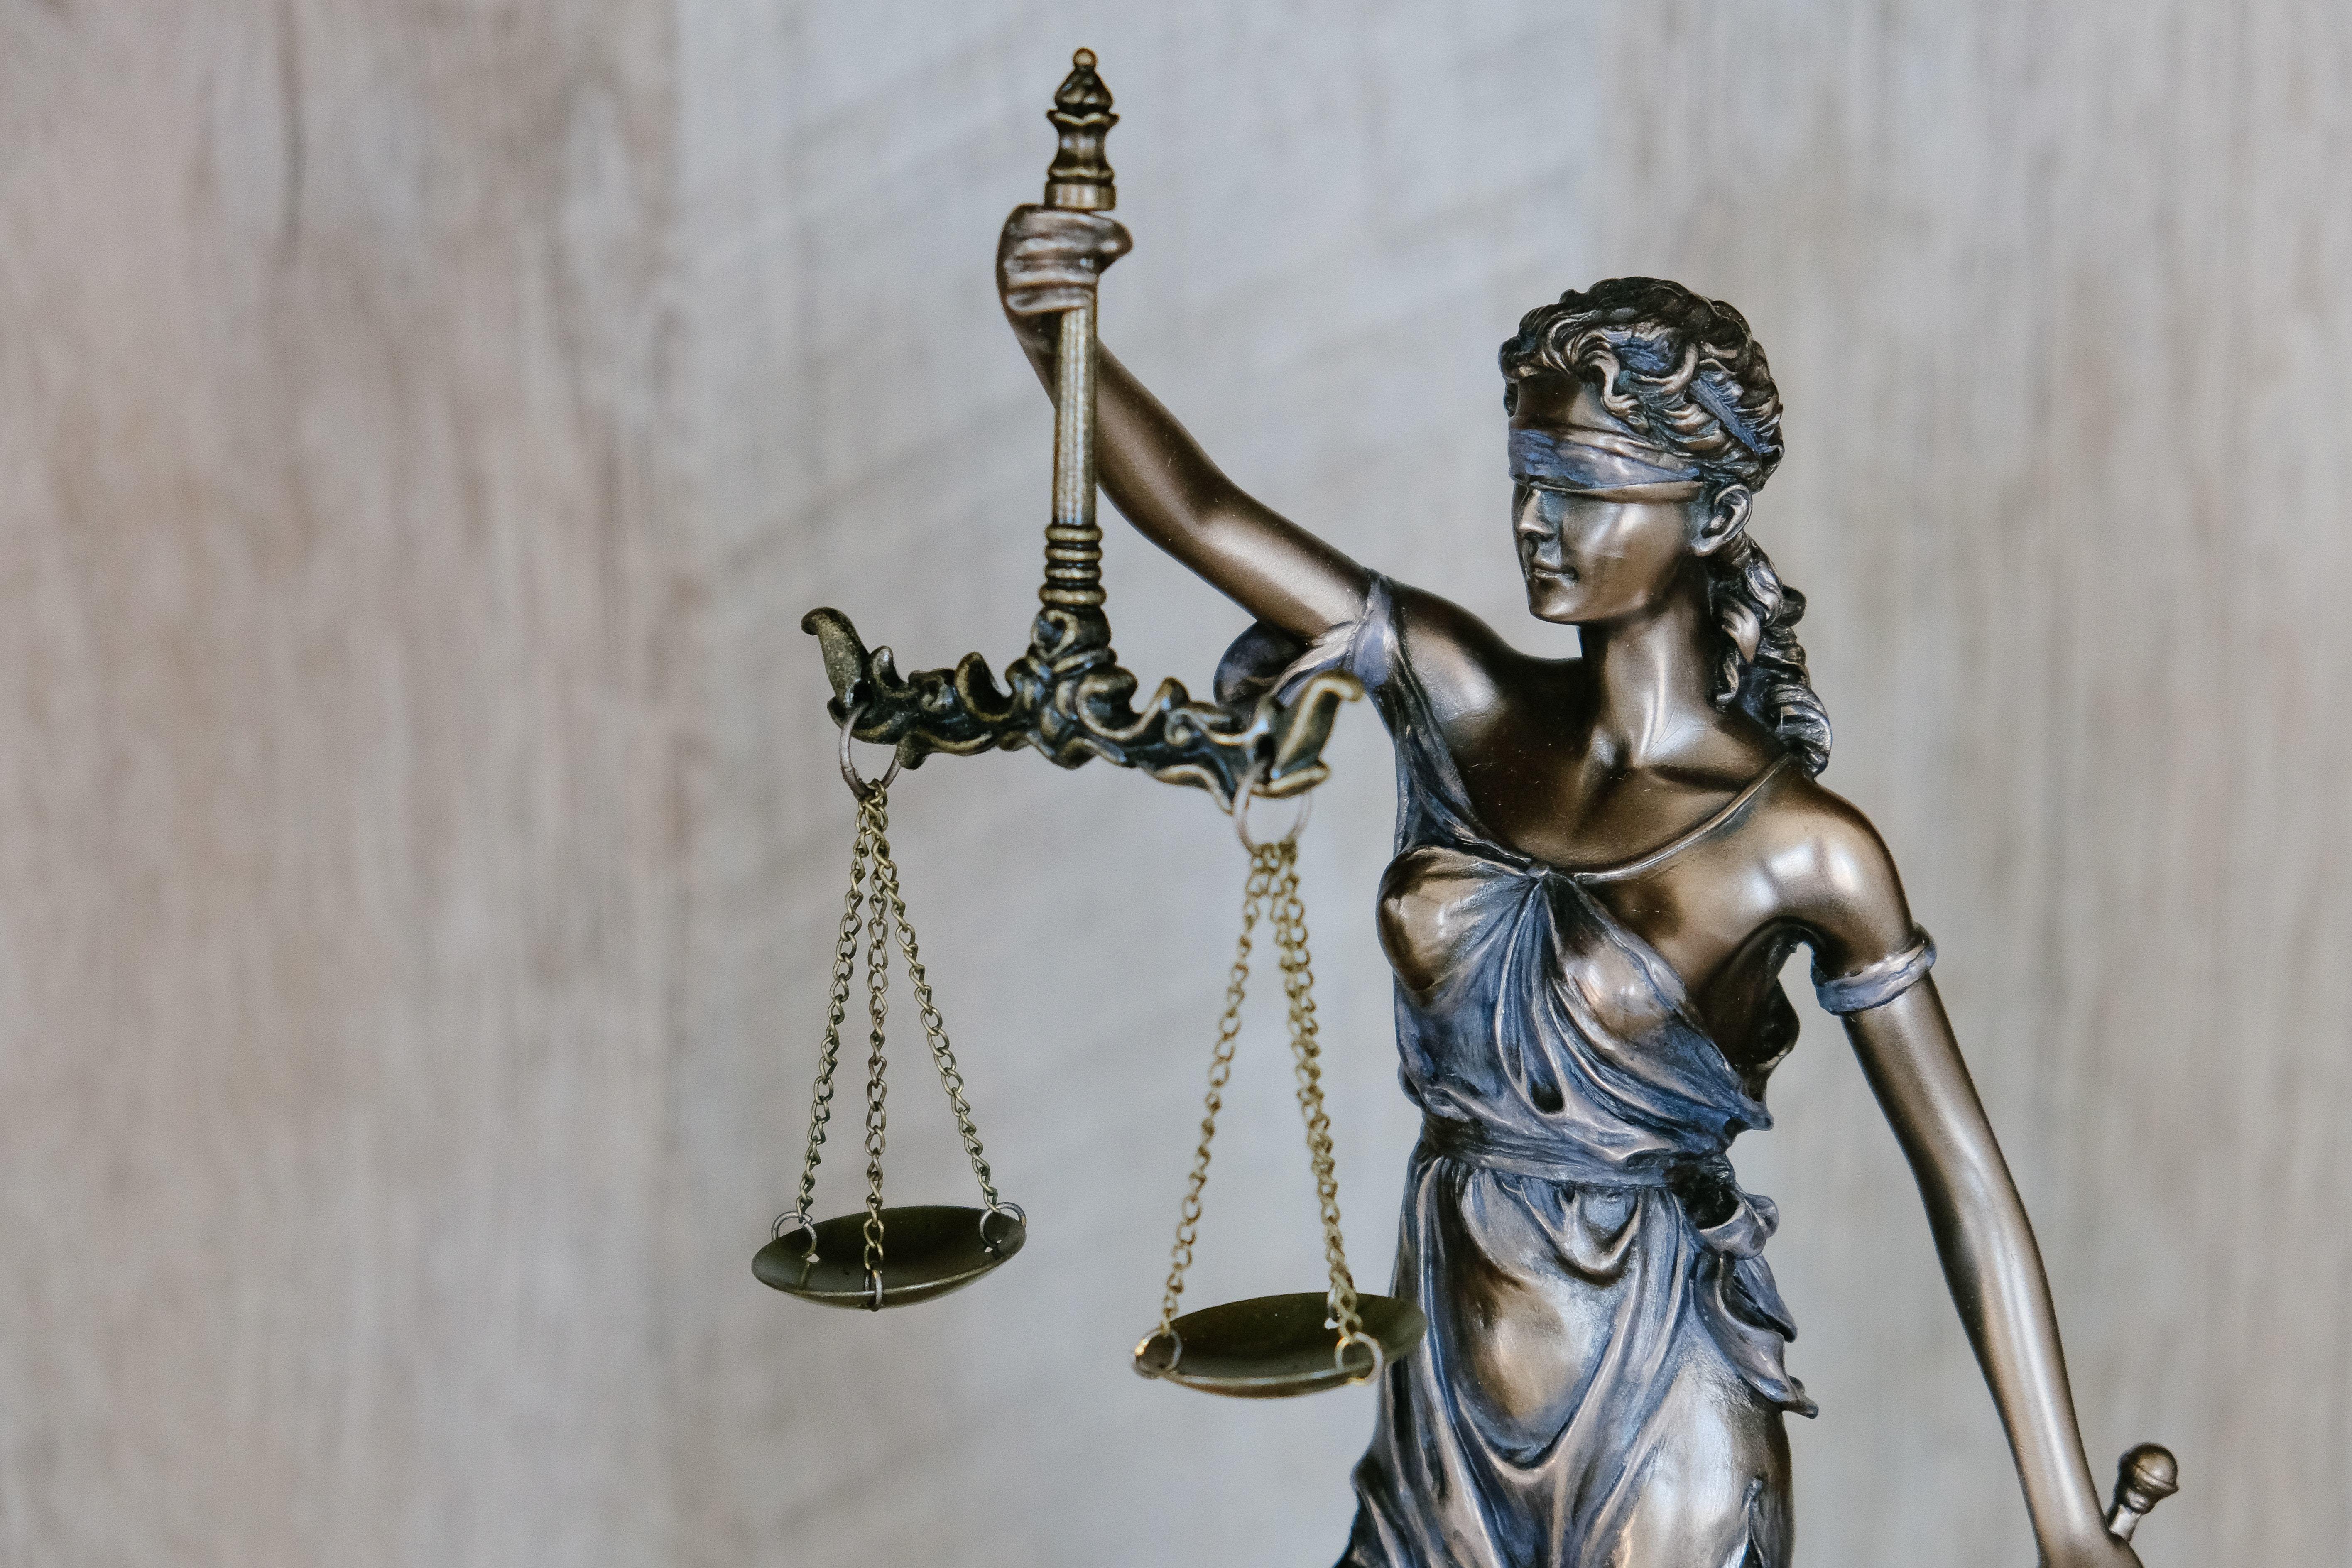 Free Civil Legal Services in Northeastern Pennsylvania